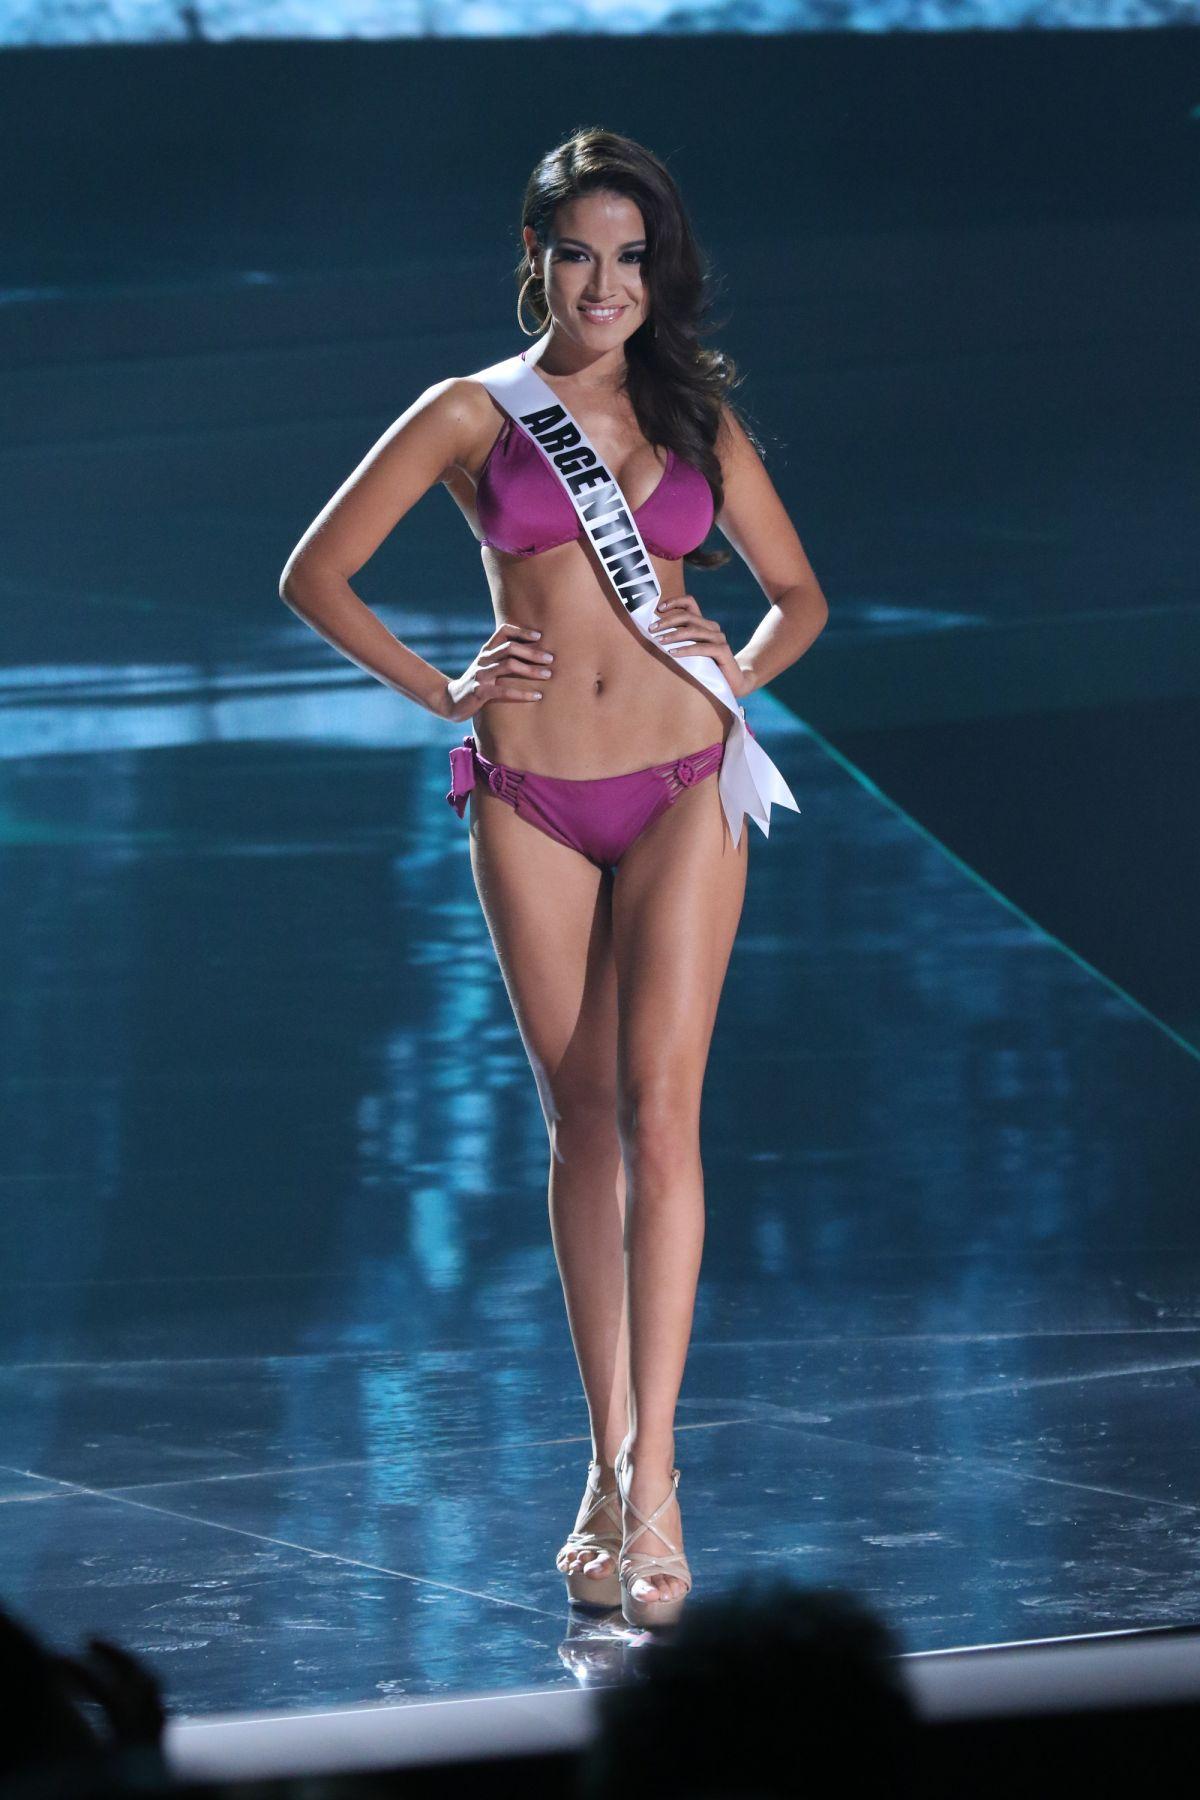 CLAUDIA BARRIONUEVO - Miss Universe 2015 Preliminary Round 12/16/2015